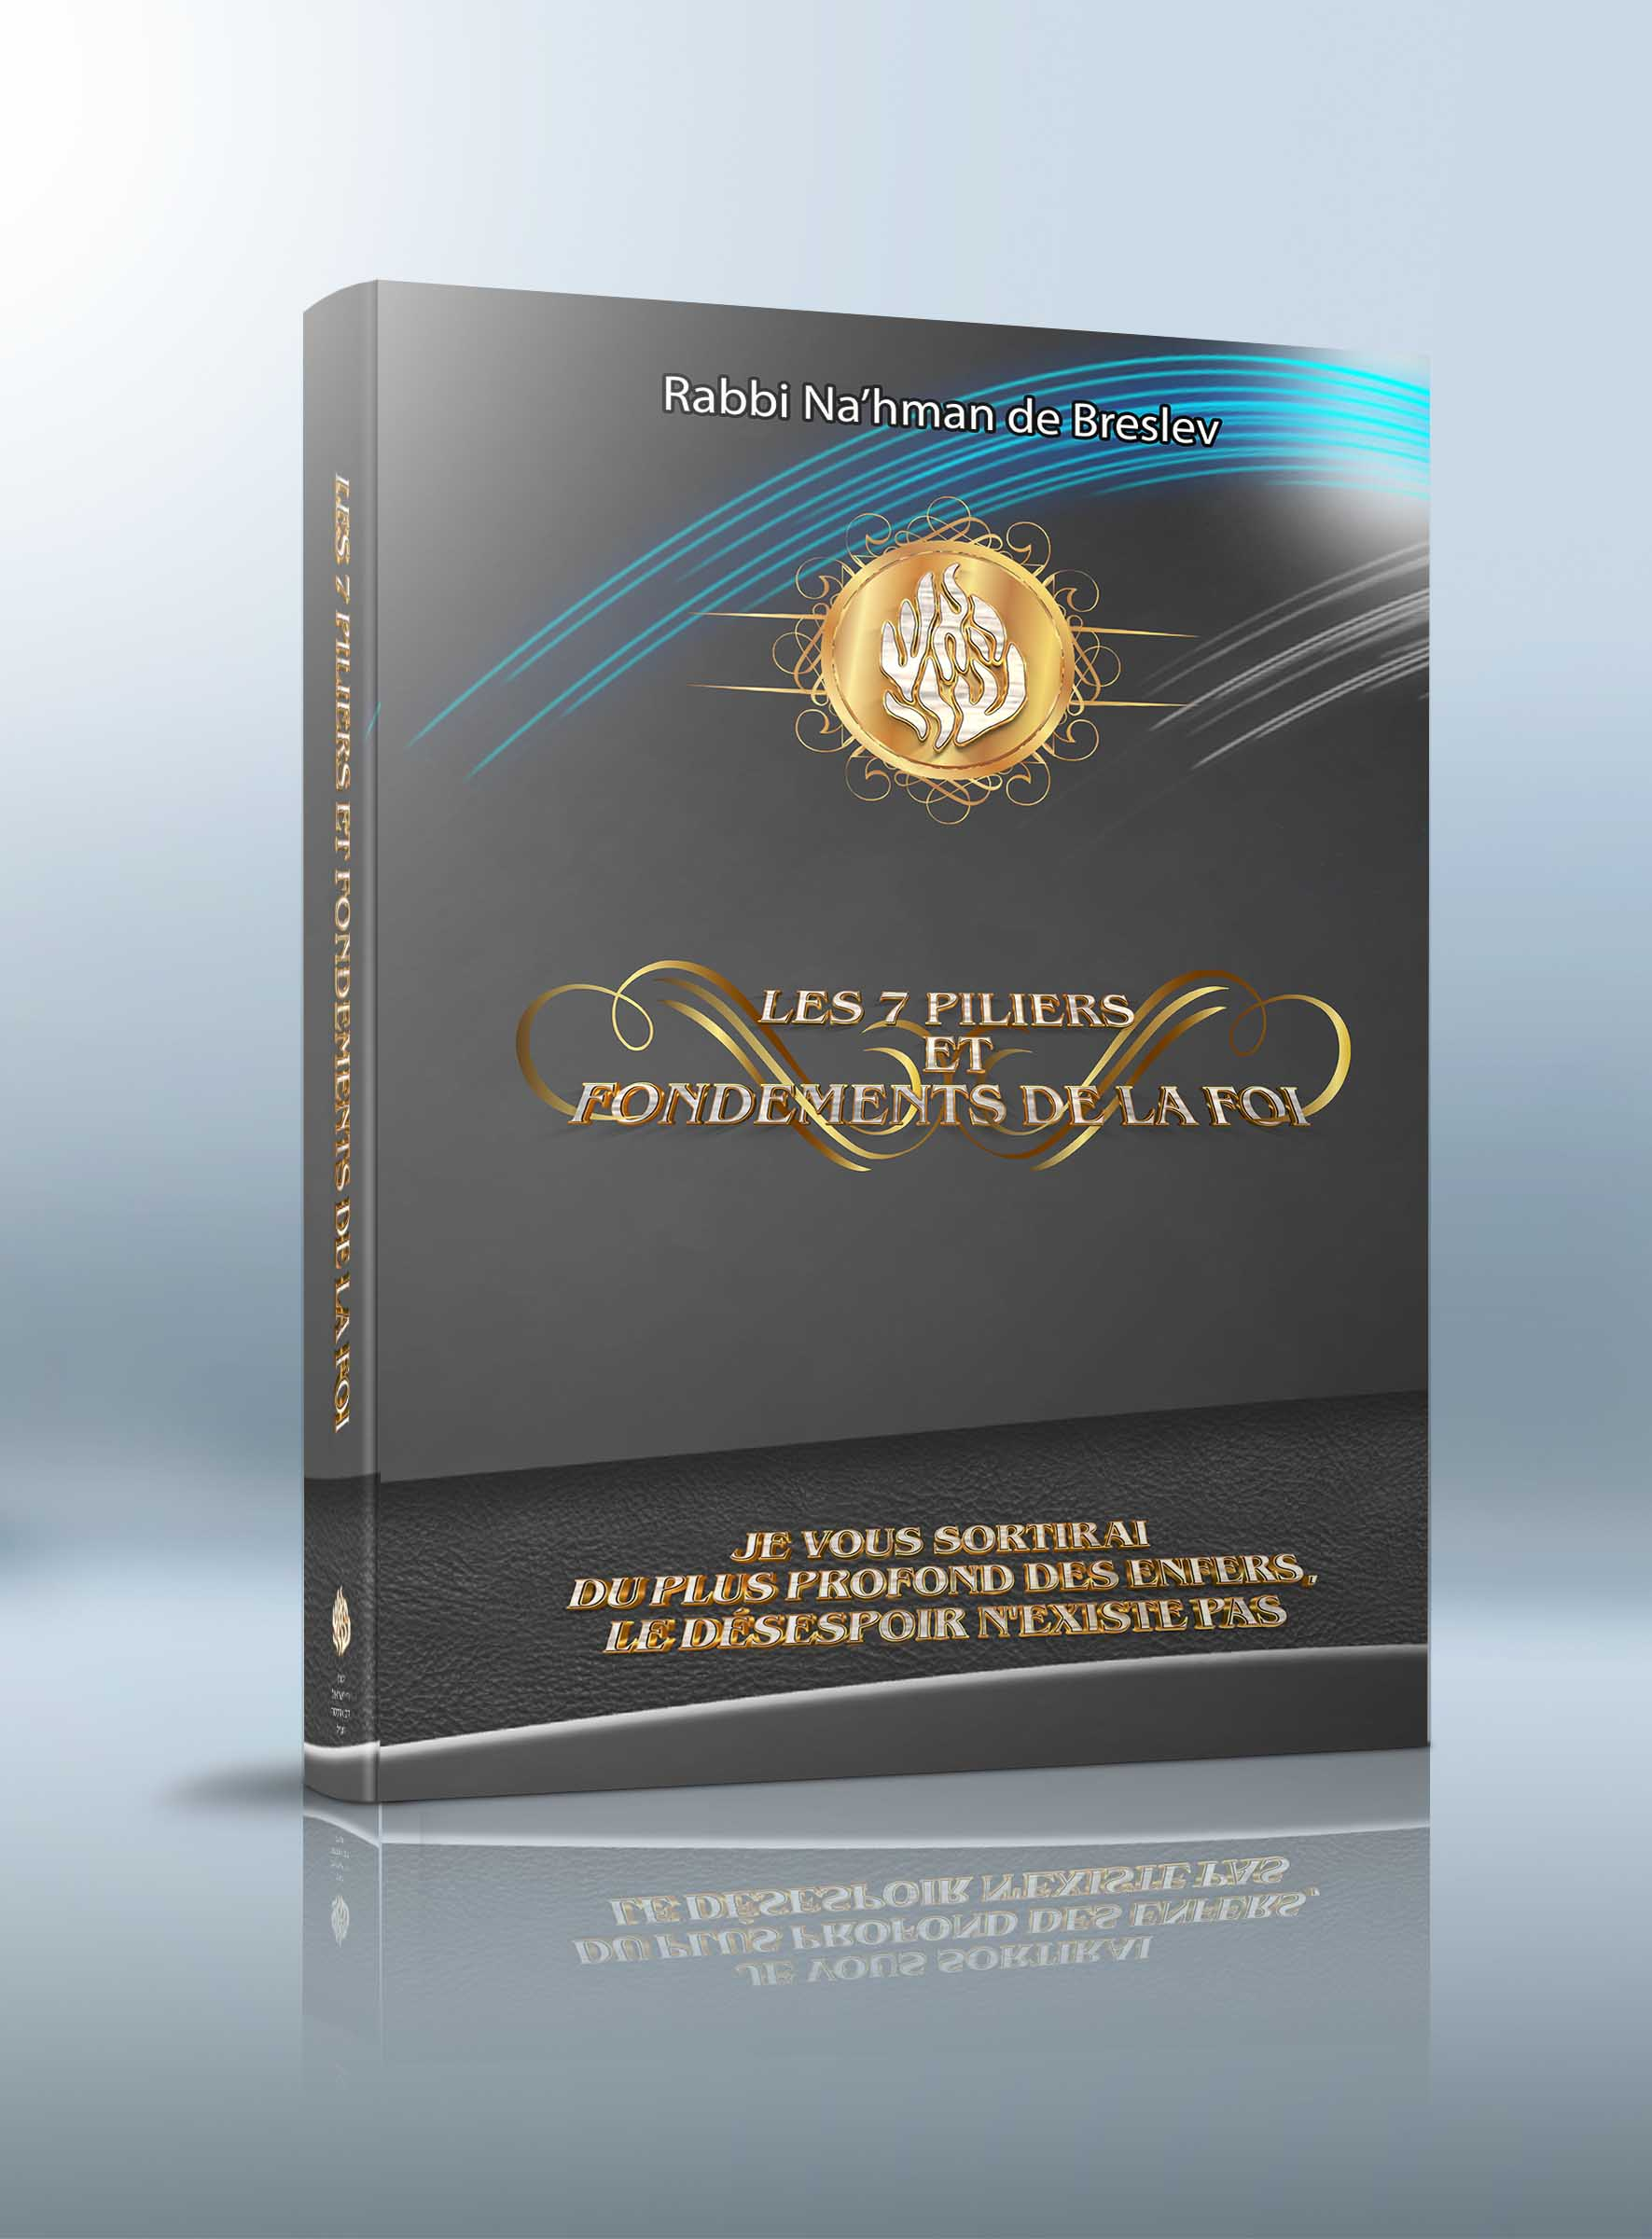 «Les 7 piliers et fondements de la foi» – 10 Shekel – LES LIVRES DE RABBI NA'HMAN